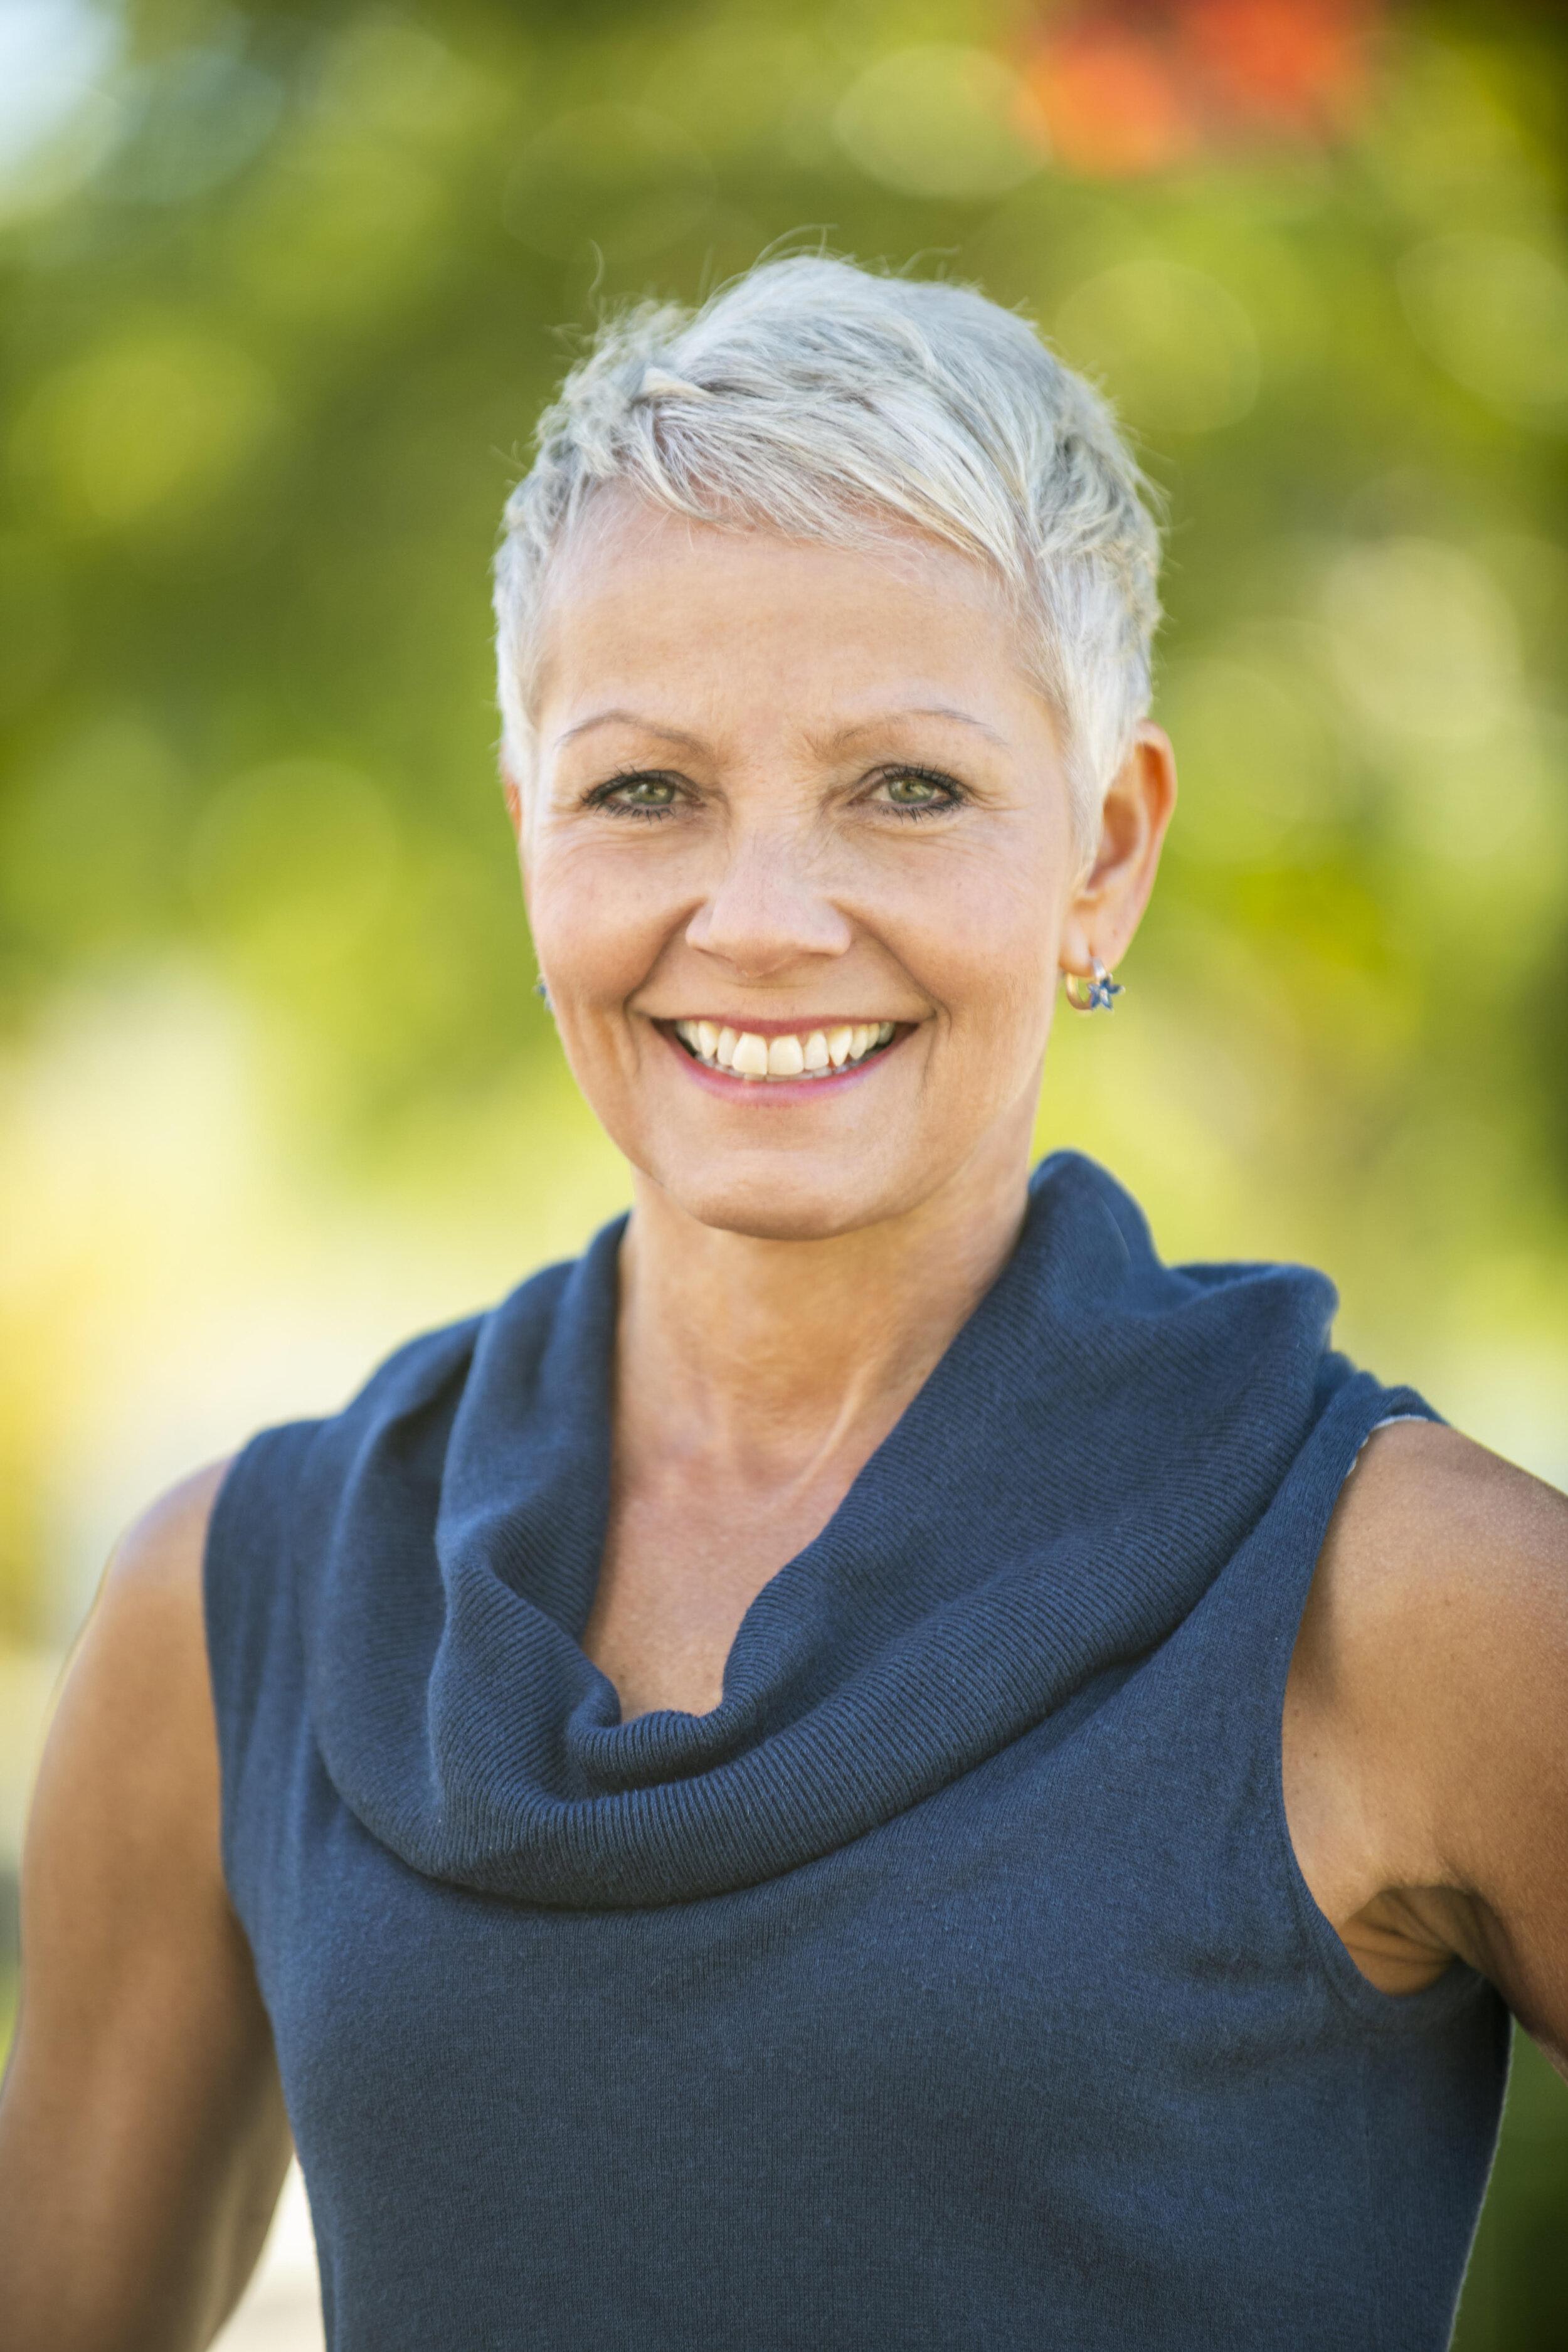 Transcending the Story Travels - Alyssa Sullivan